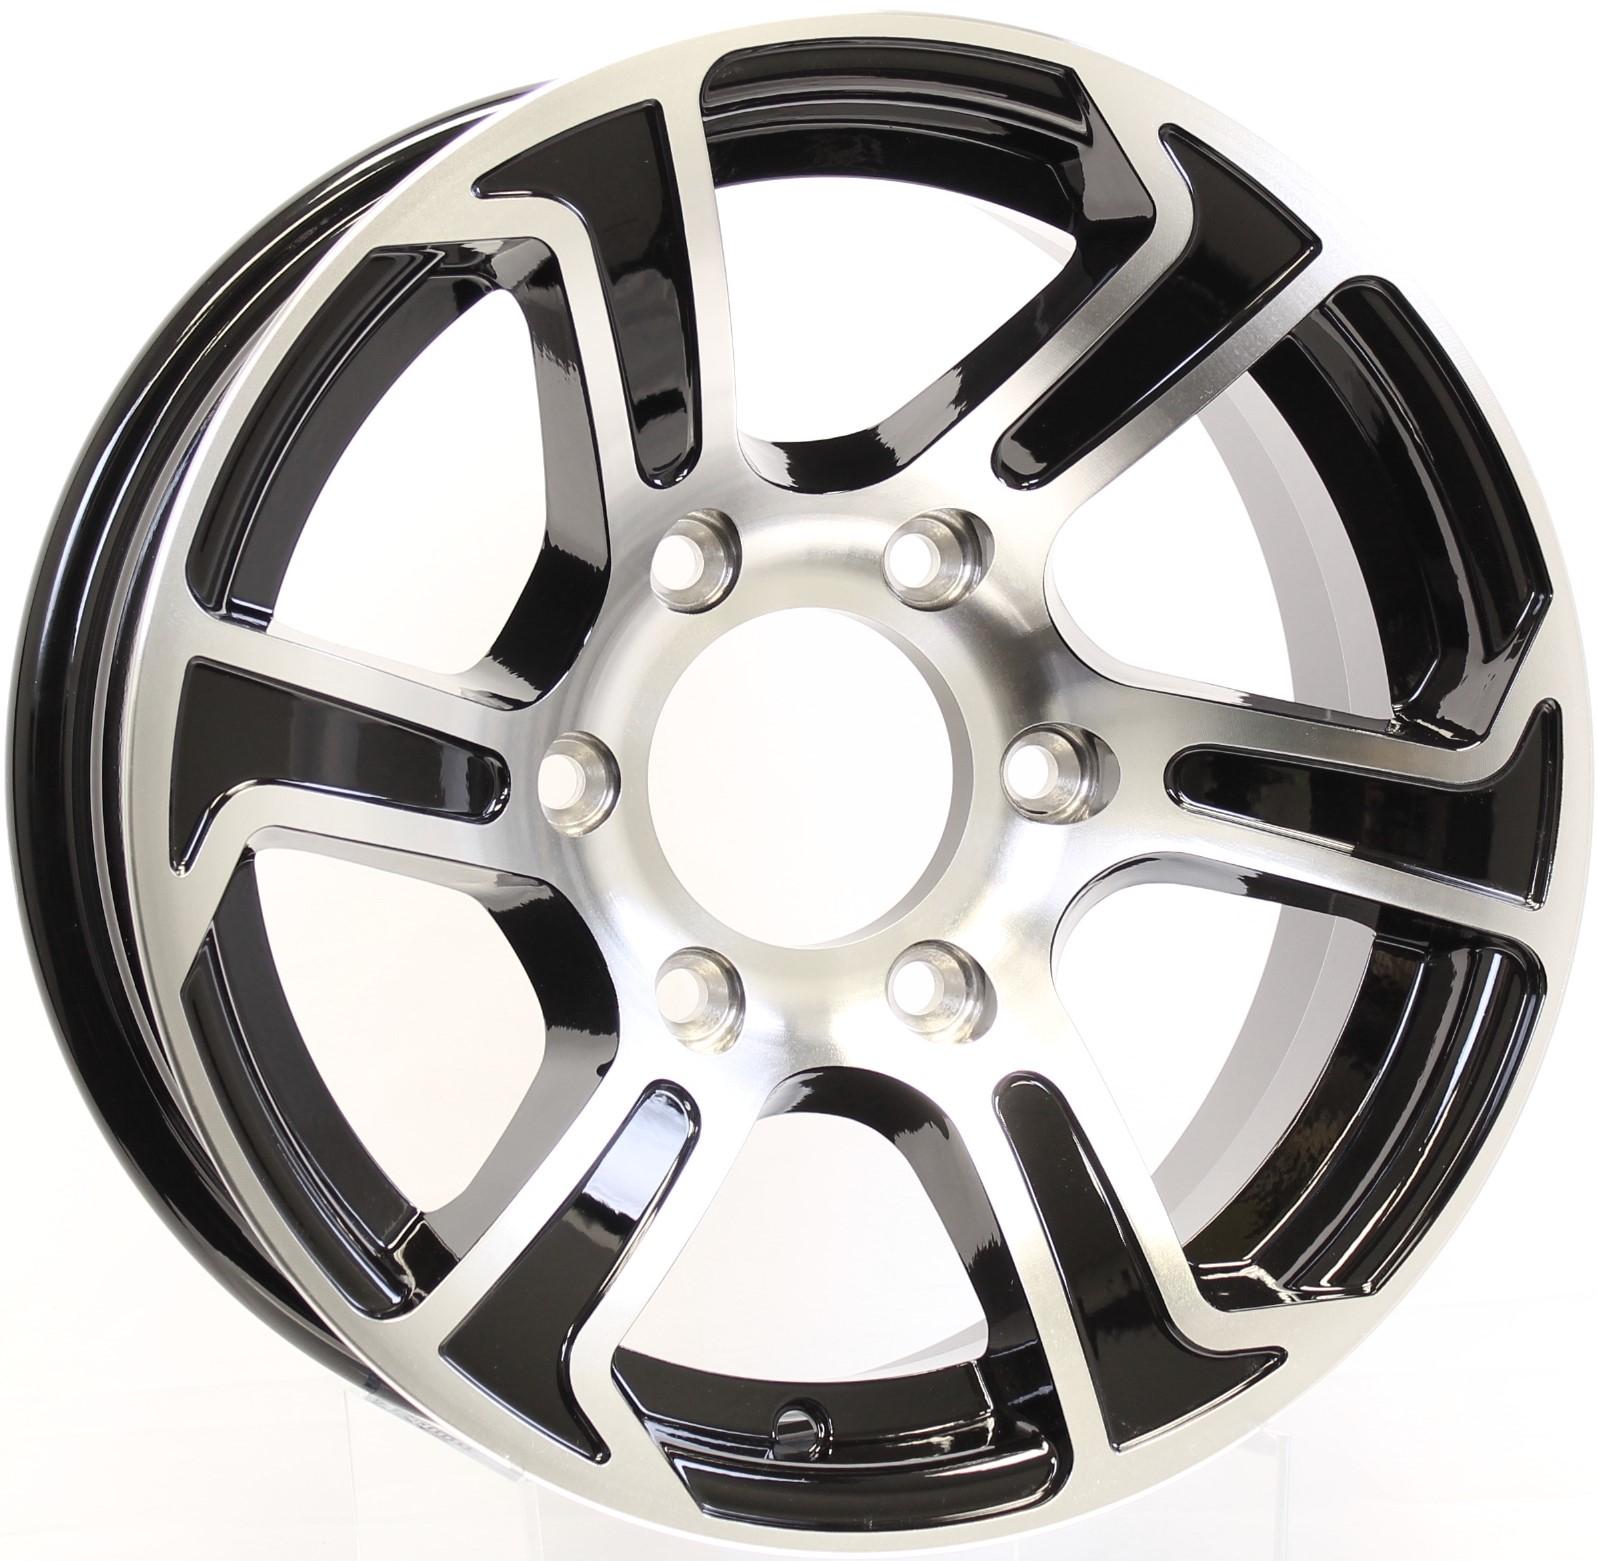 Summit- 15x6 6-5.5 Black Aluminum Trailer Wheel Image